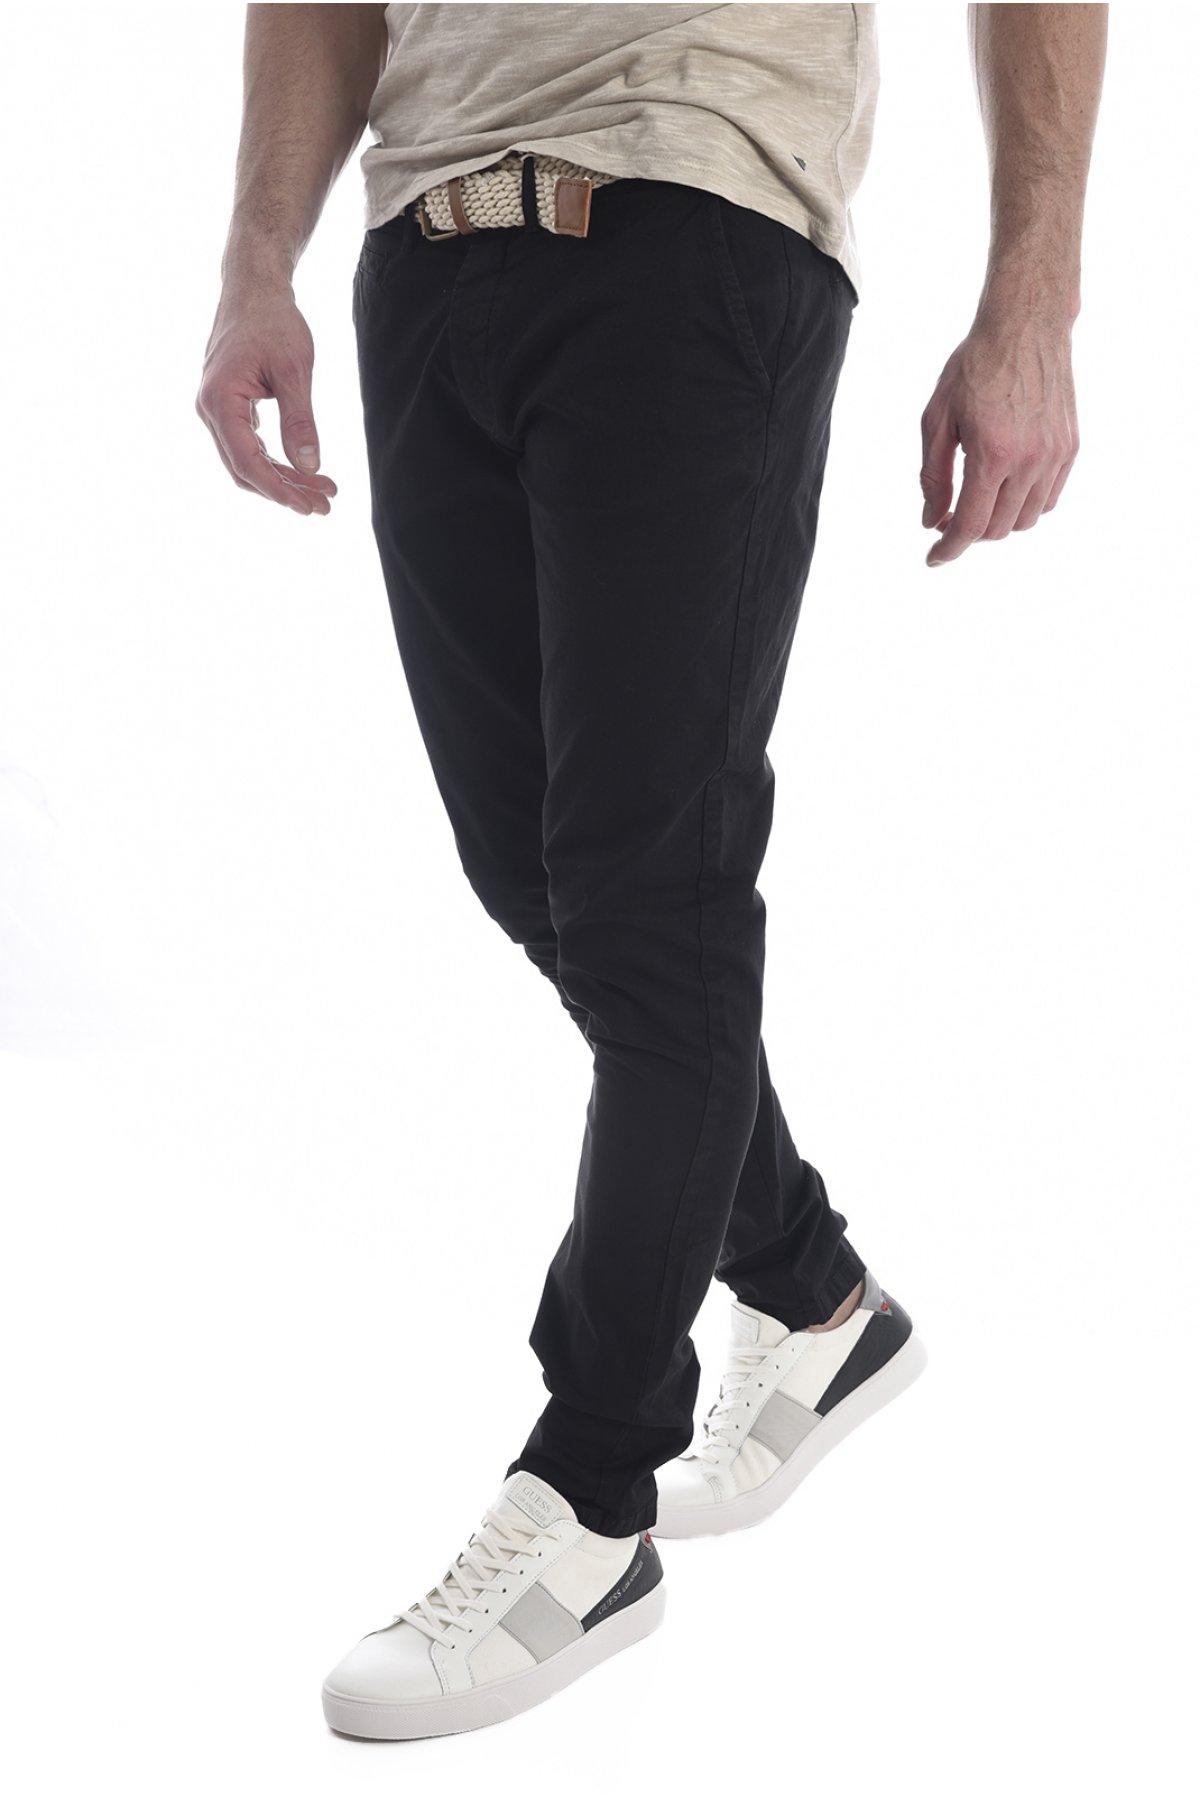 Pantalon Chino Stretch Allen - Backlight